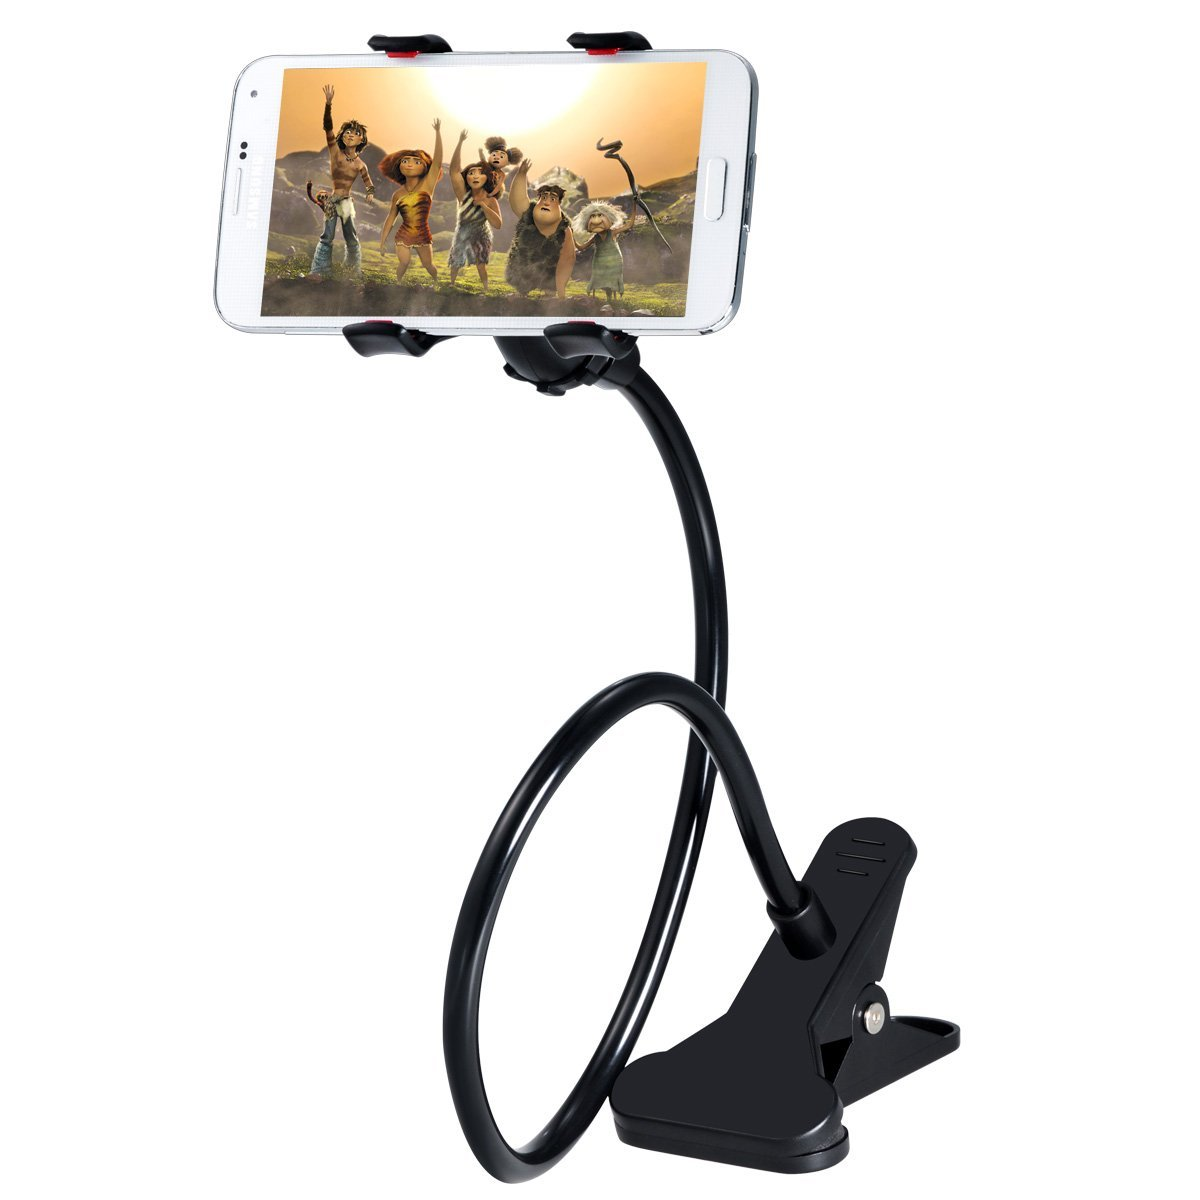 Arm mobile phone holder stand 85cm Long Lazy Bed Desktop Mobile Phone ...